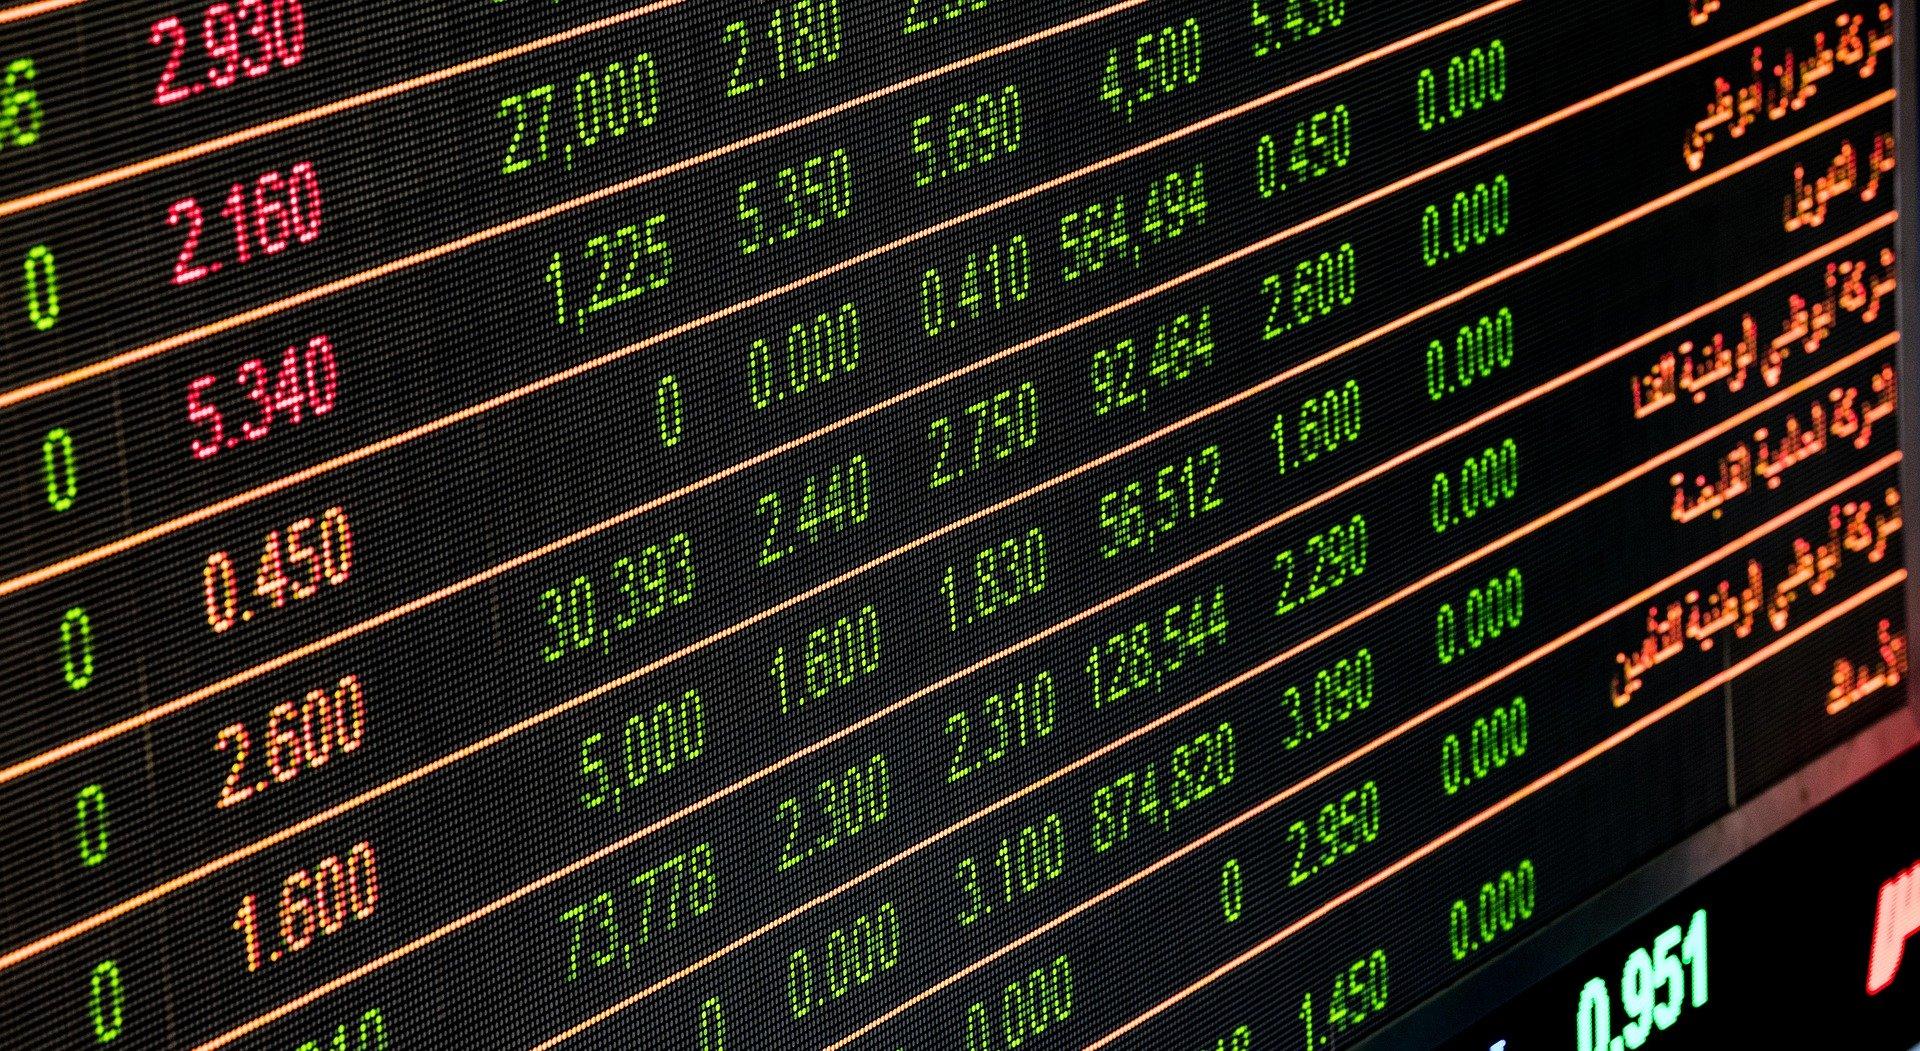 Analyse auf Bitcoin Code